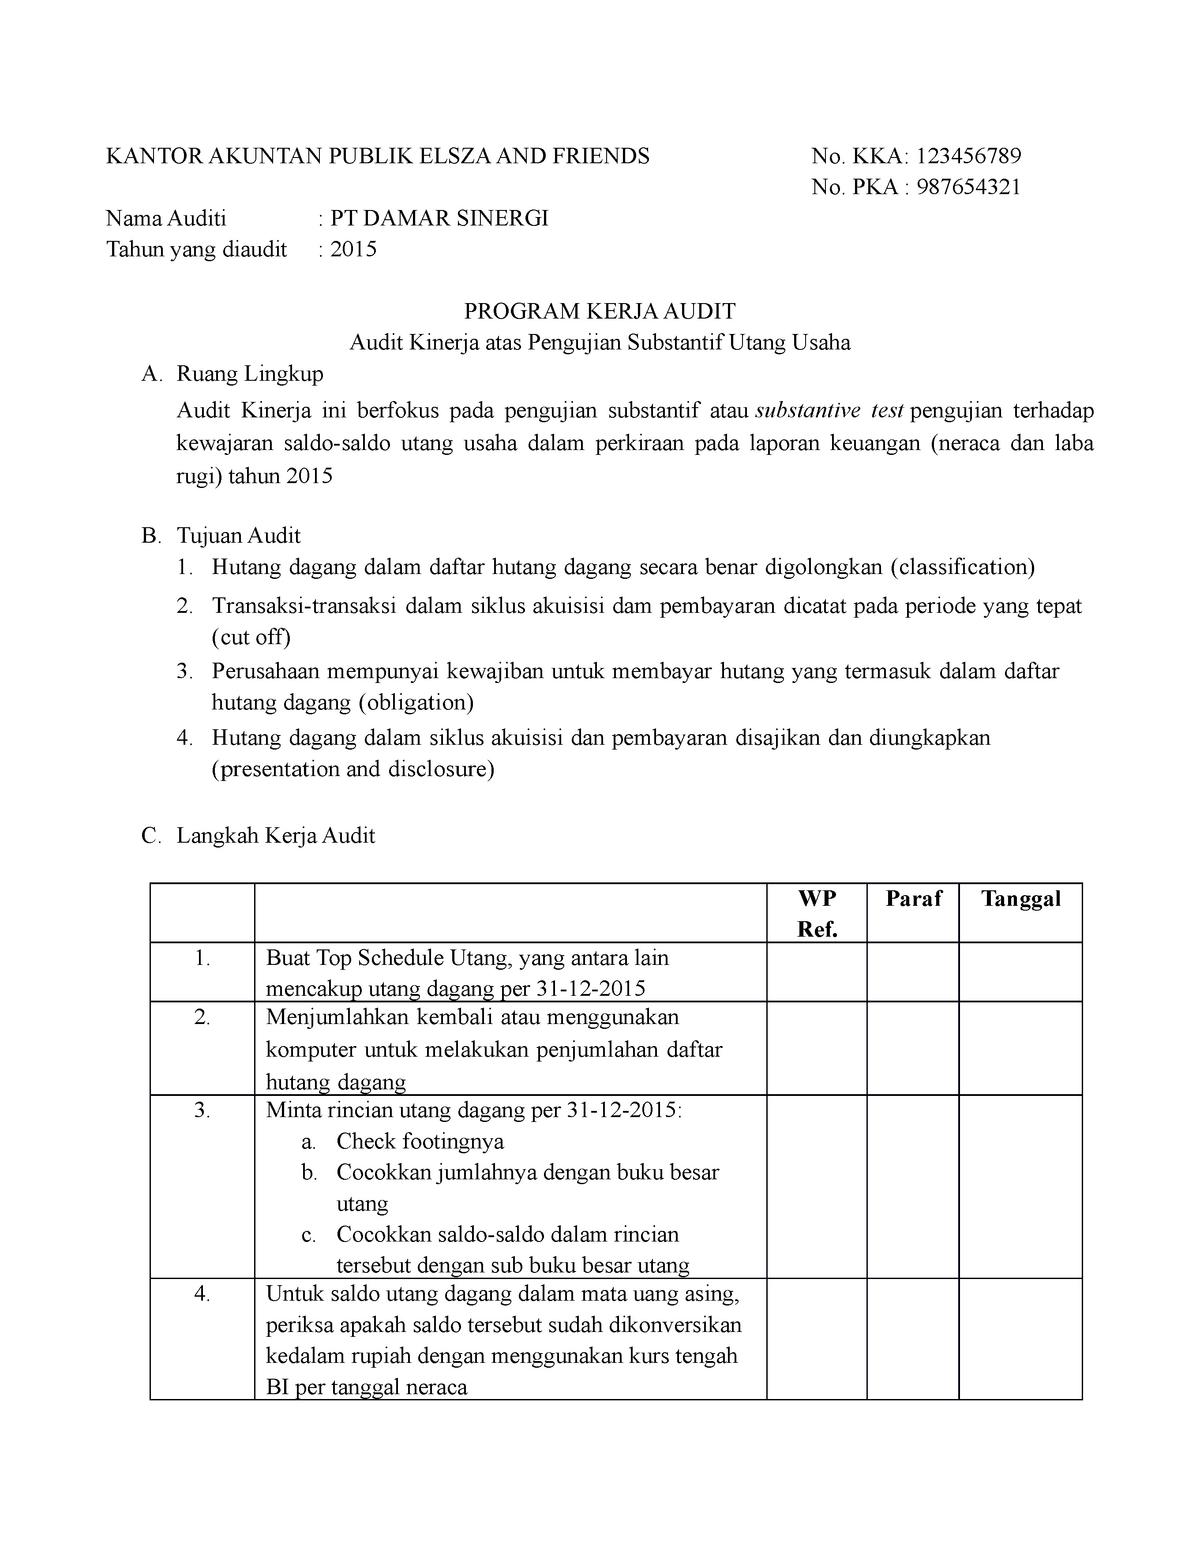 Contoh Program Audit Akt3223 Usu Studocu